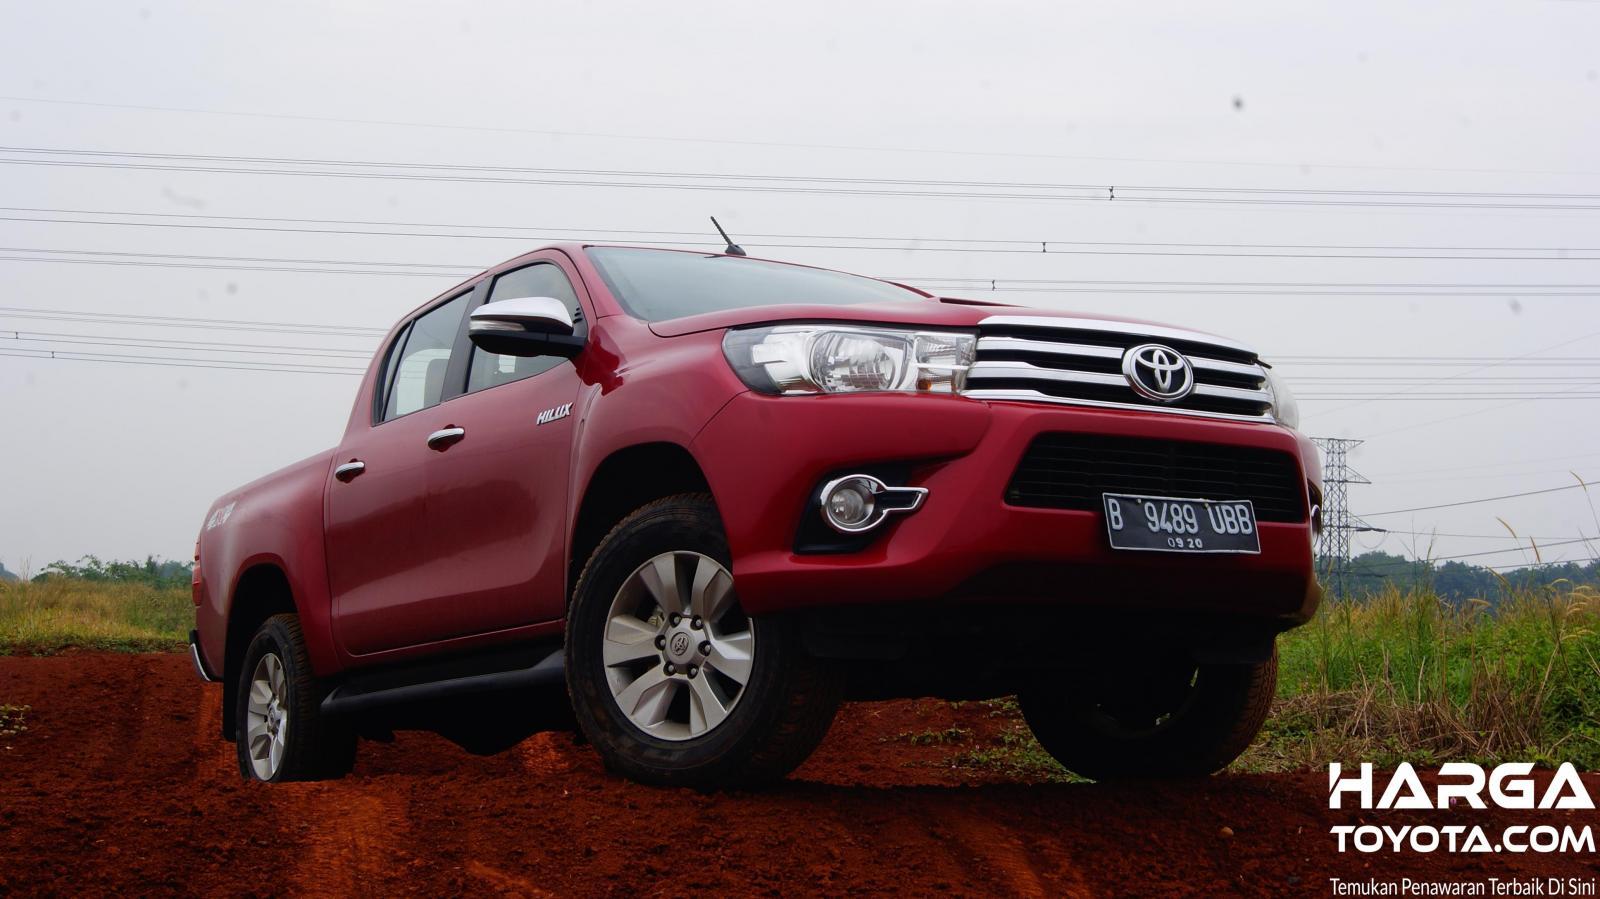 Tampak Toyota Hilux V 2.5 2015 berwarna merah